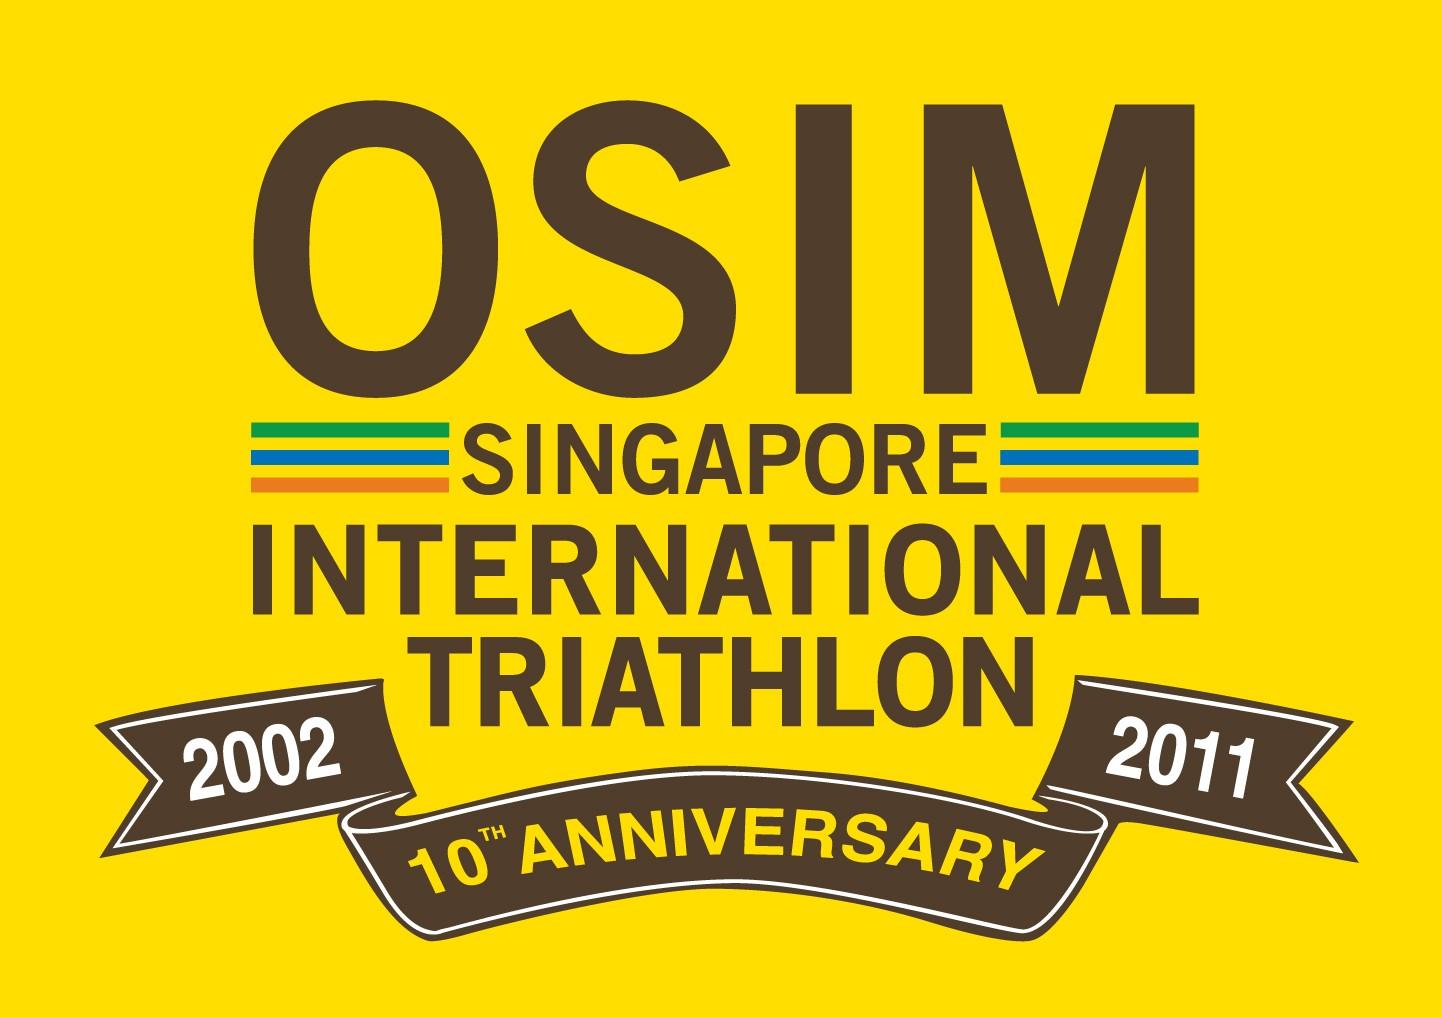 http://3.bp.blogspot.com/-jZF40GYfXzE/TjYV9b1IohI/AAAAAAAABdw/LkEzz3YE_E4/s1600/OSIM+Singapore+International+Triathlon+2011+Winners.jpg